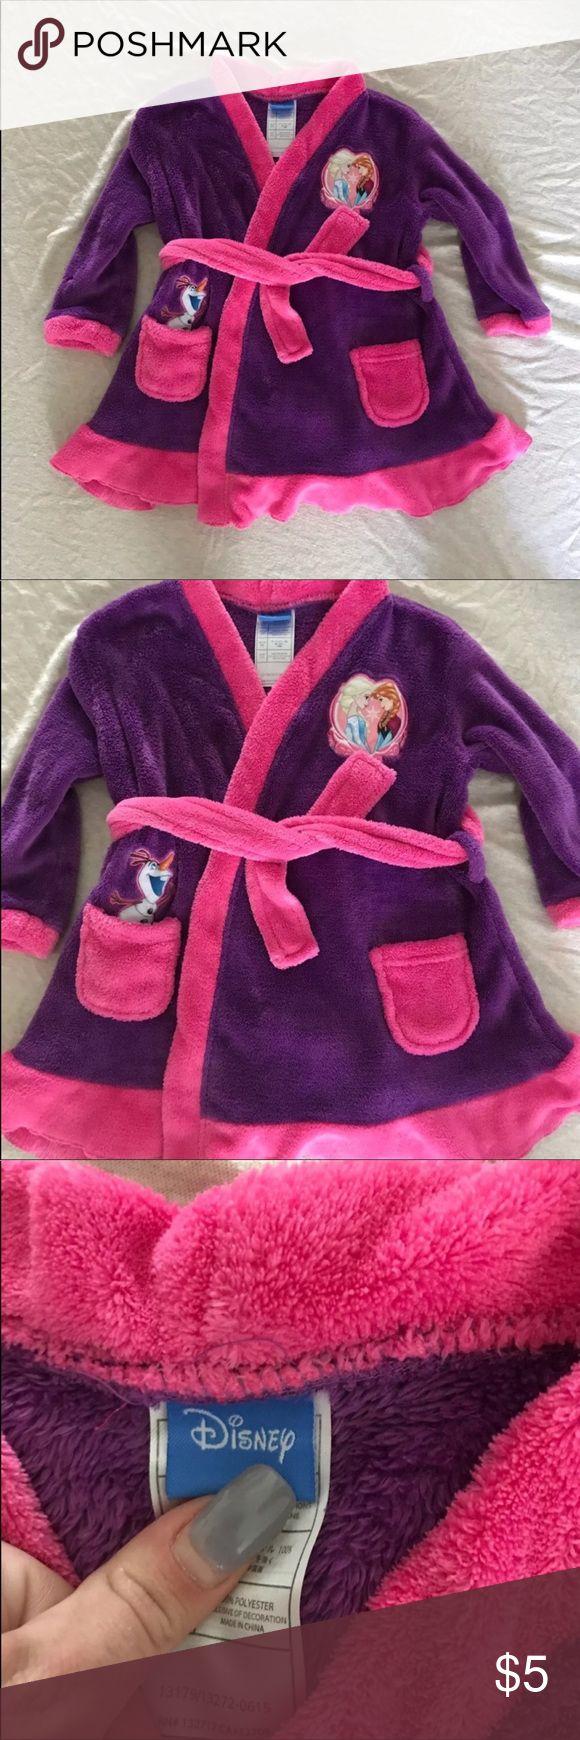 Disney Frozen Robe